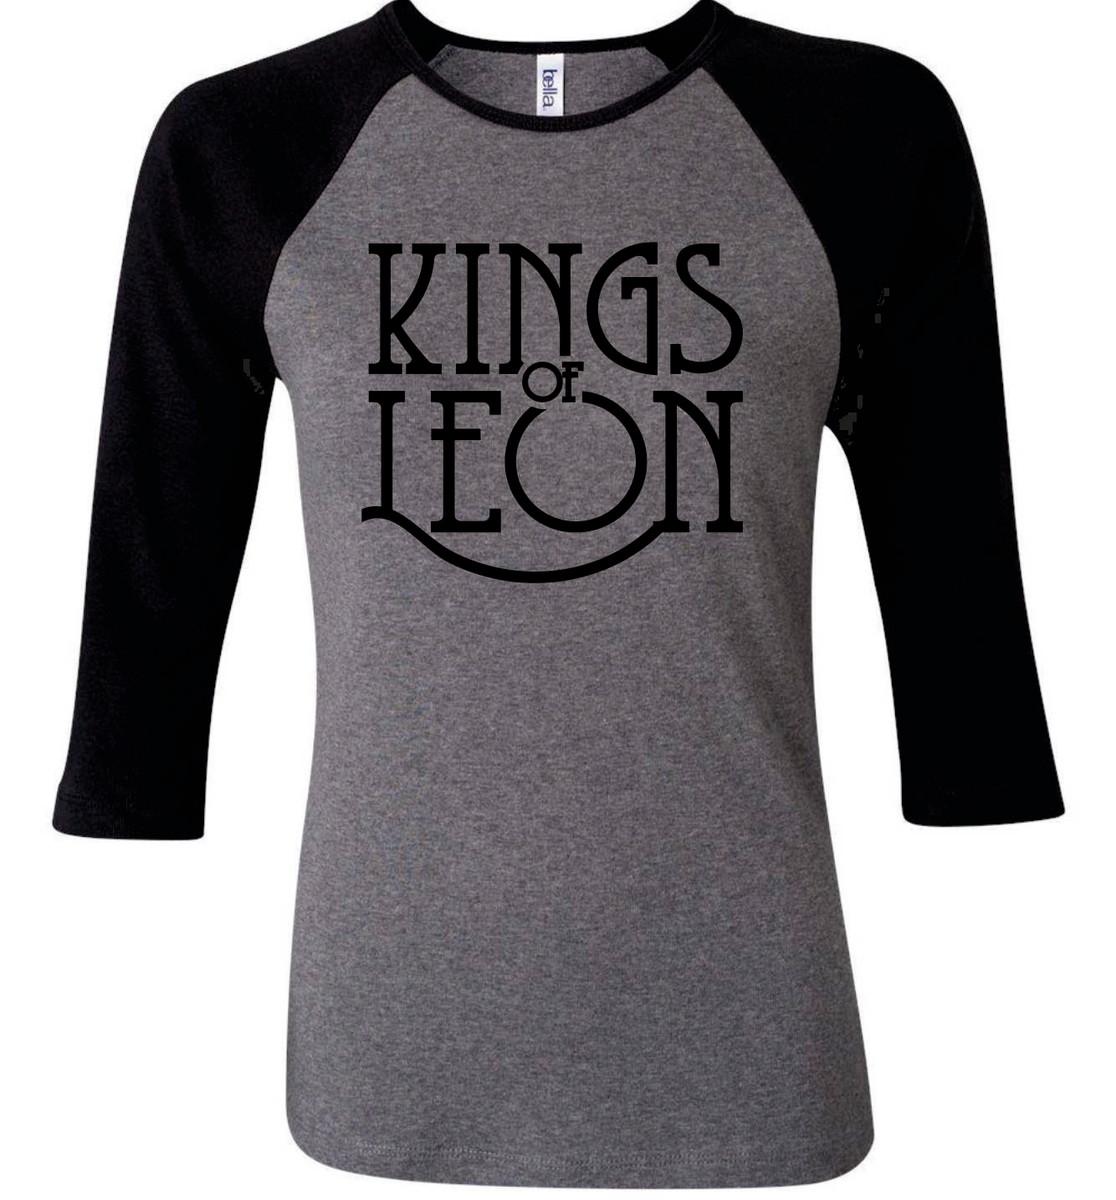 98dbdb216d15 Camiseta Raglan 3/4 Kings Of Leon no Elo7 | Camisetas Personalizadas ...